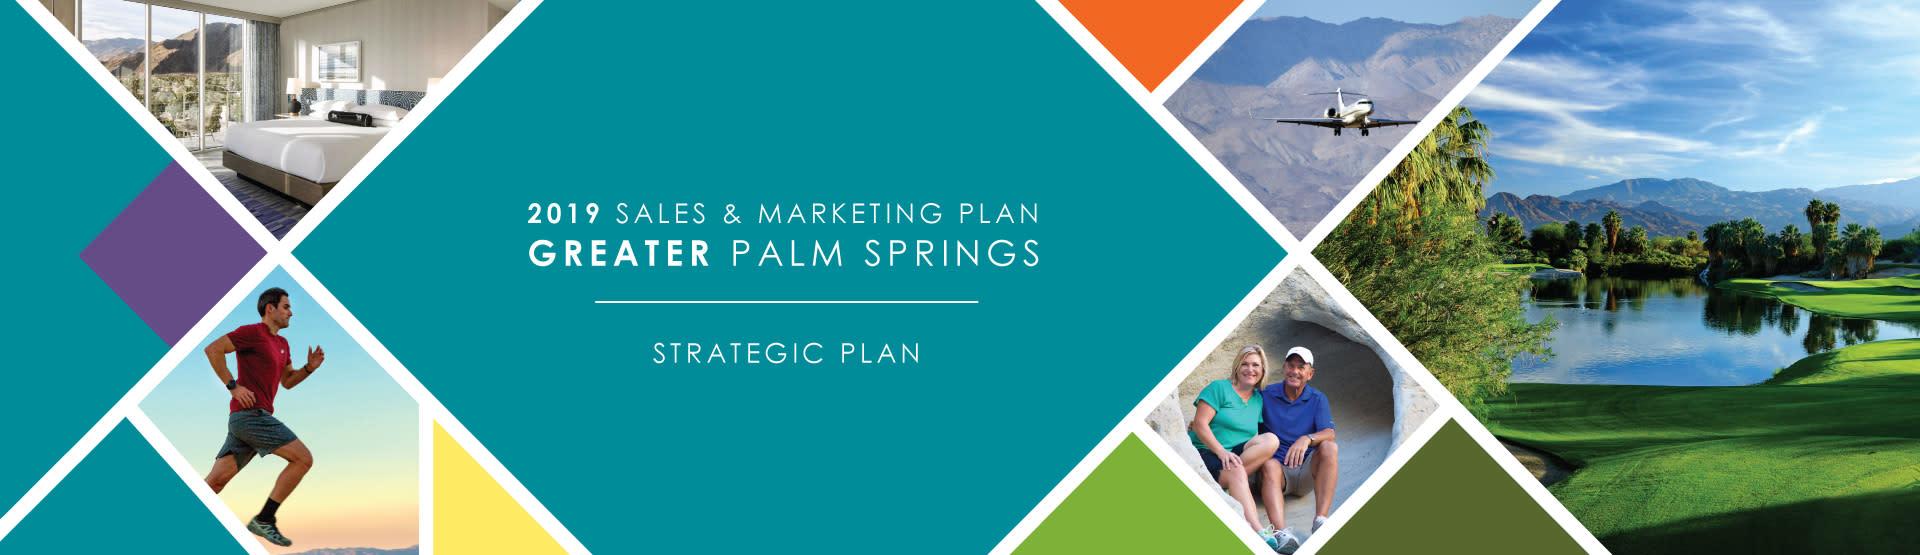 Strategic Plan Header